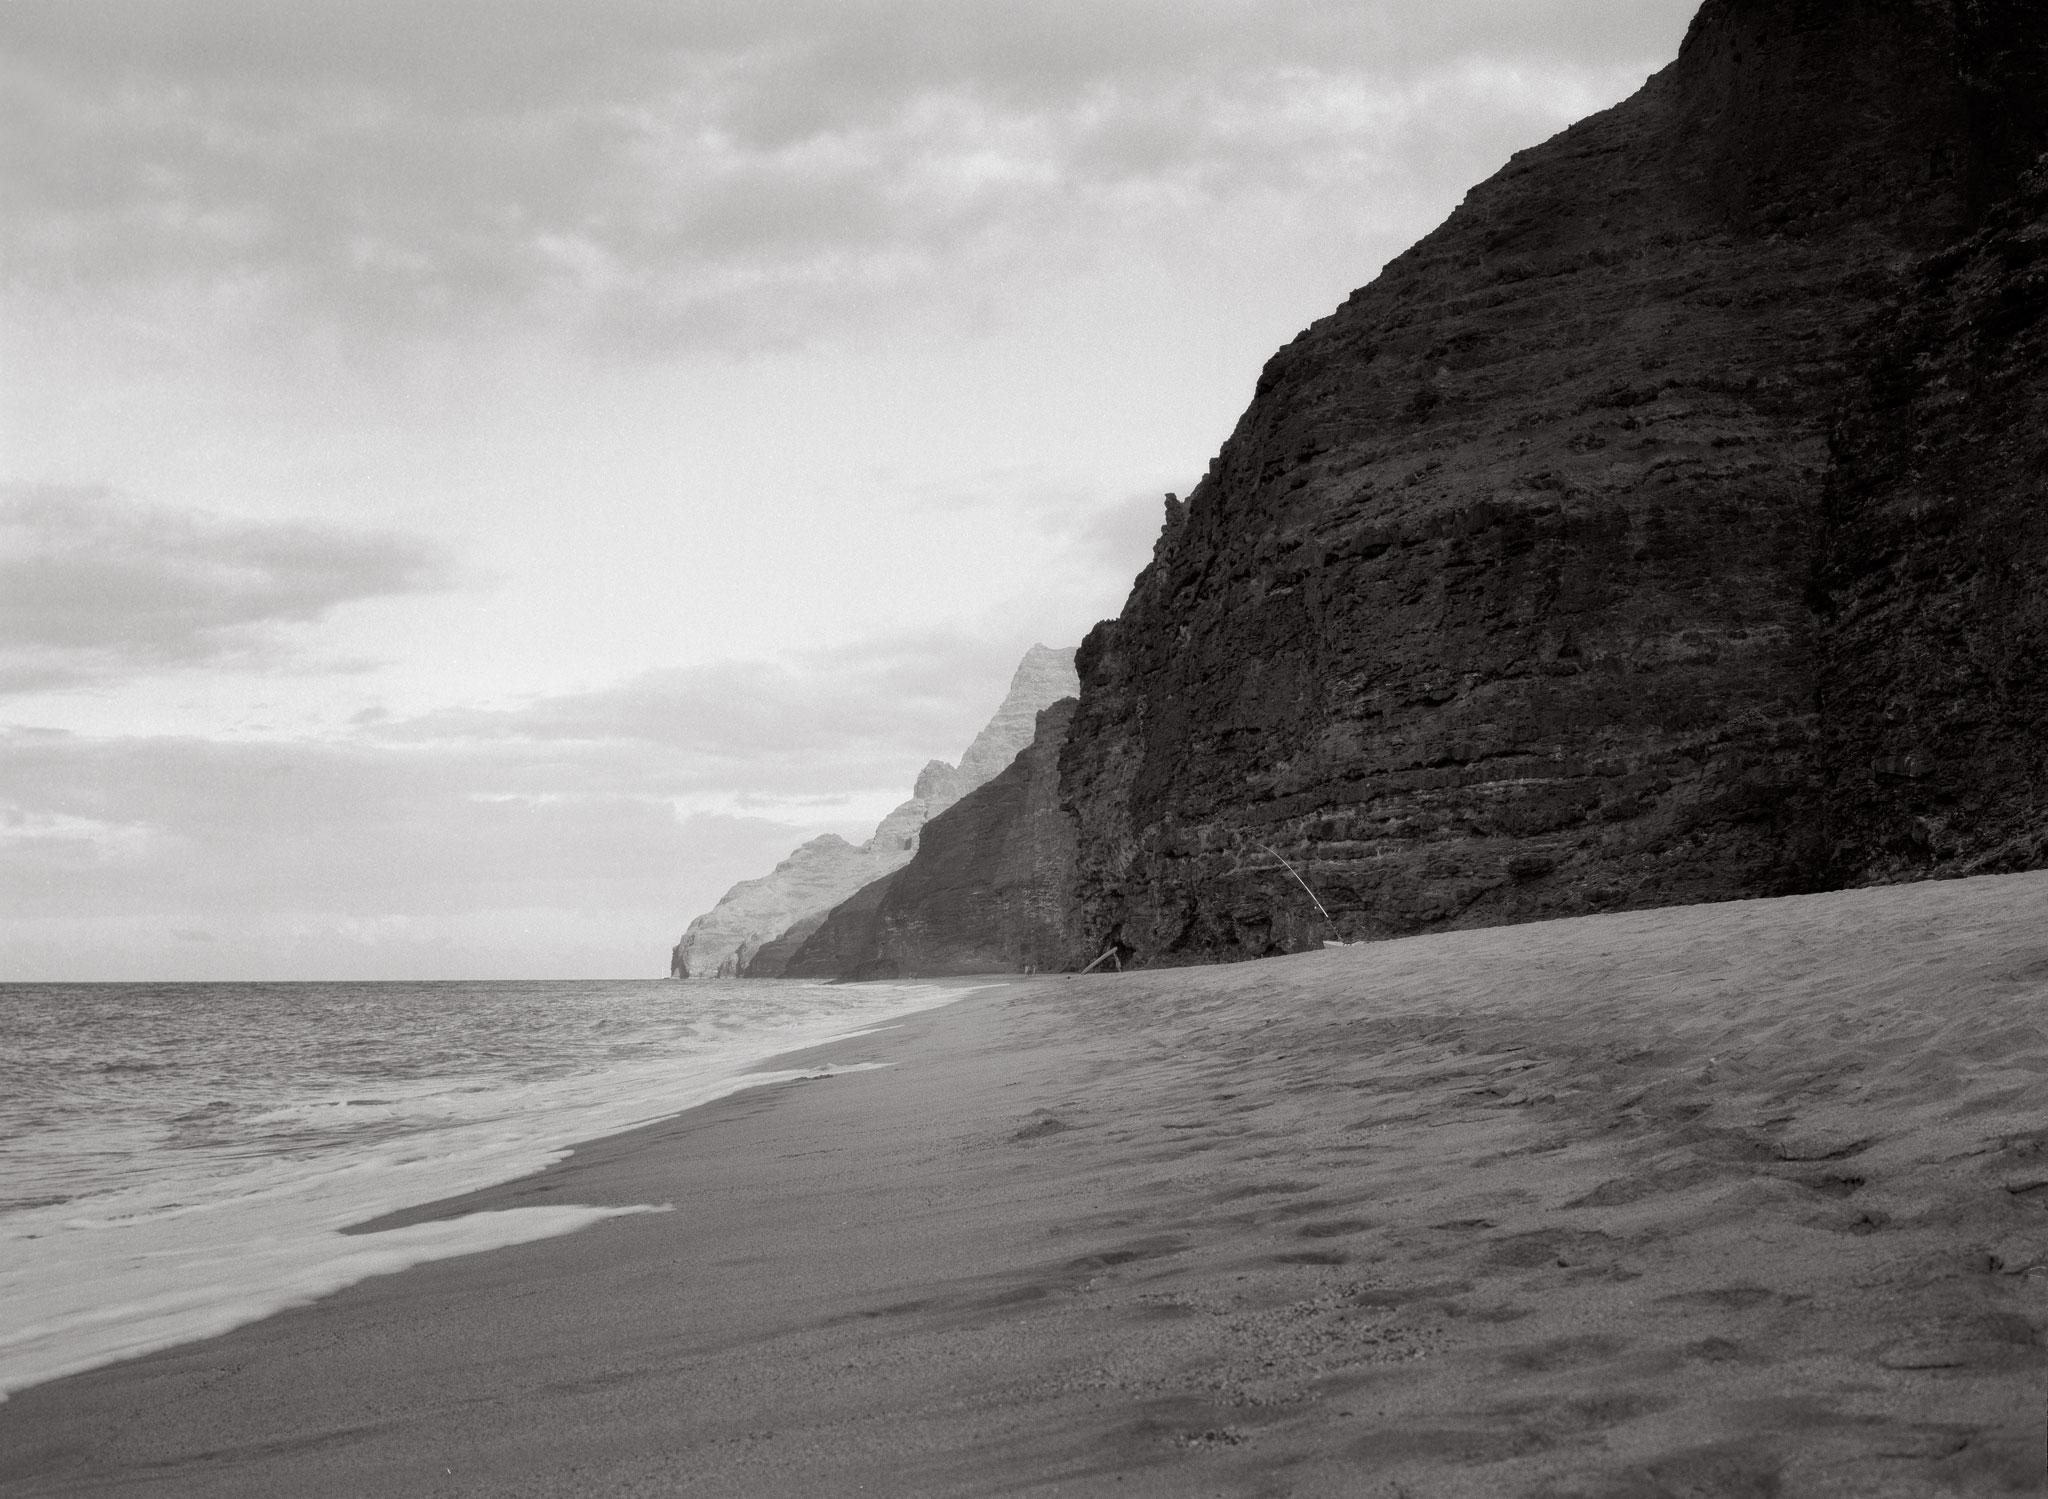 Copy of Kalalau shores, Kauai 2013